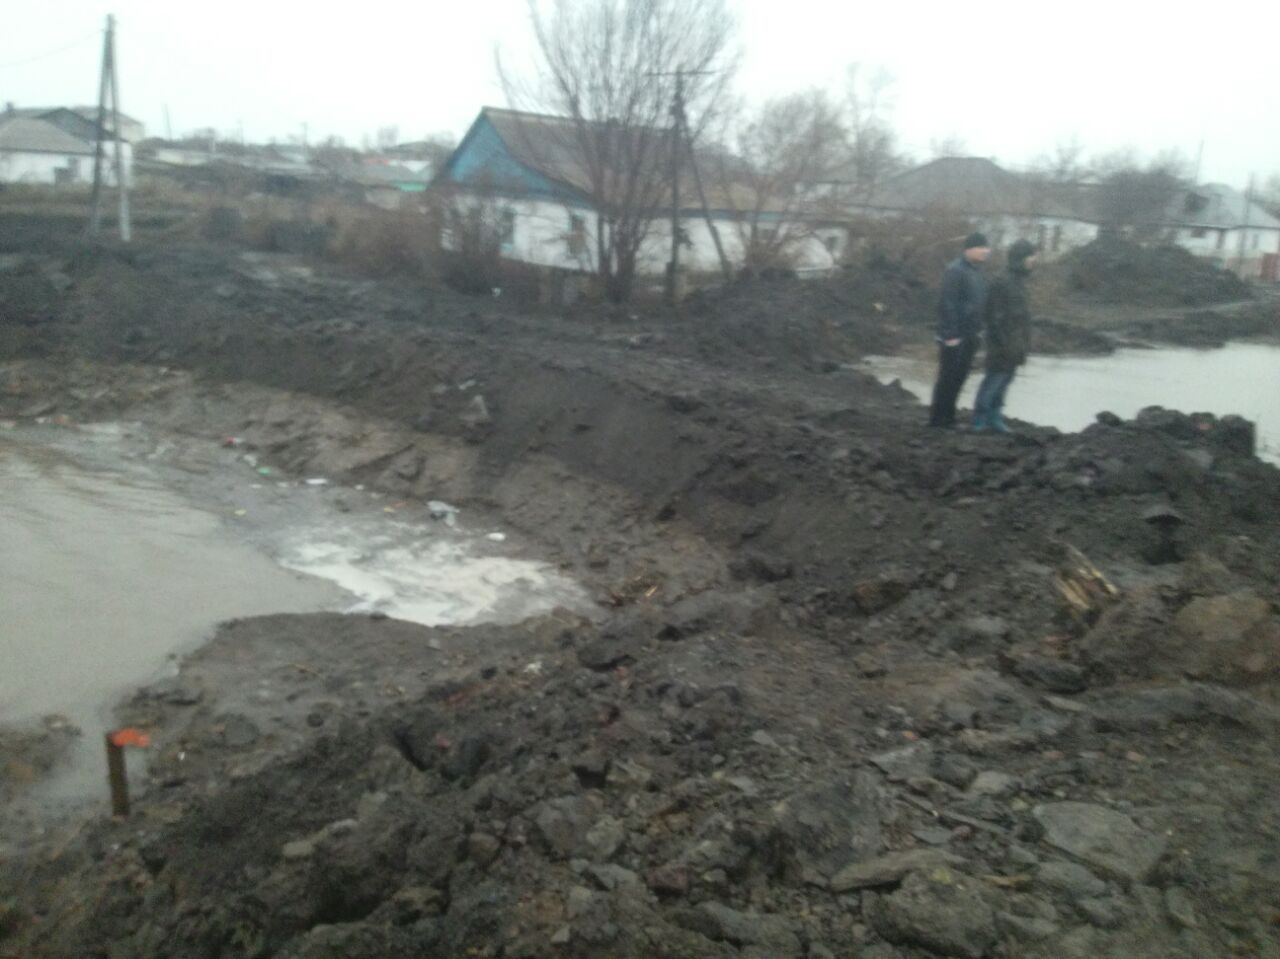 ВКазахстане прорвало дамбу, затоплен город Атбасар